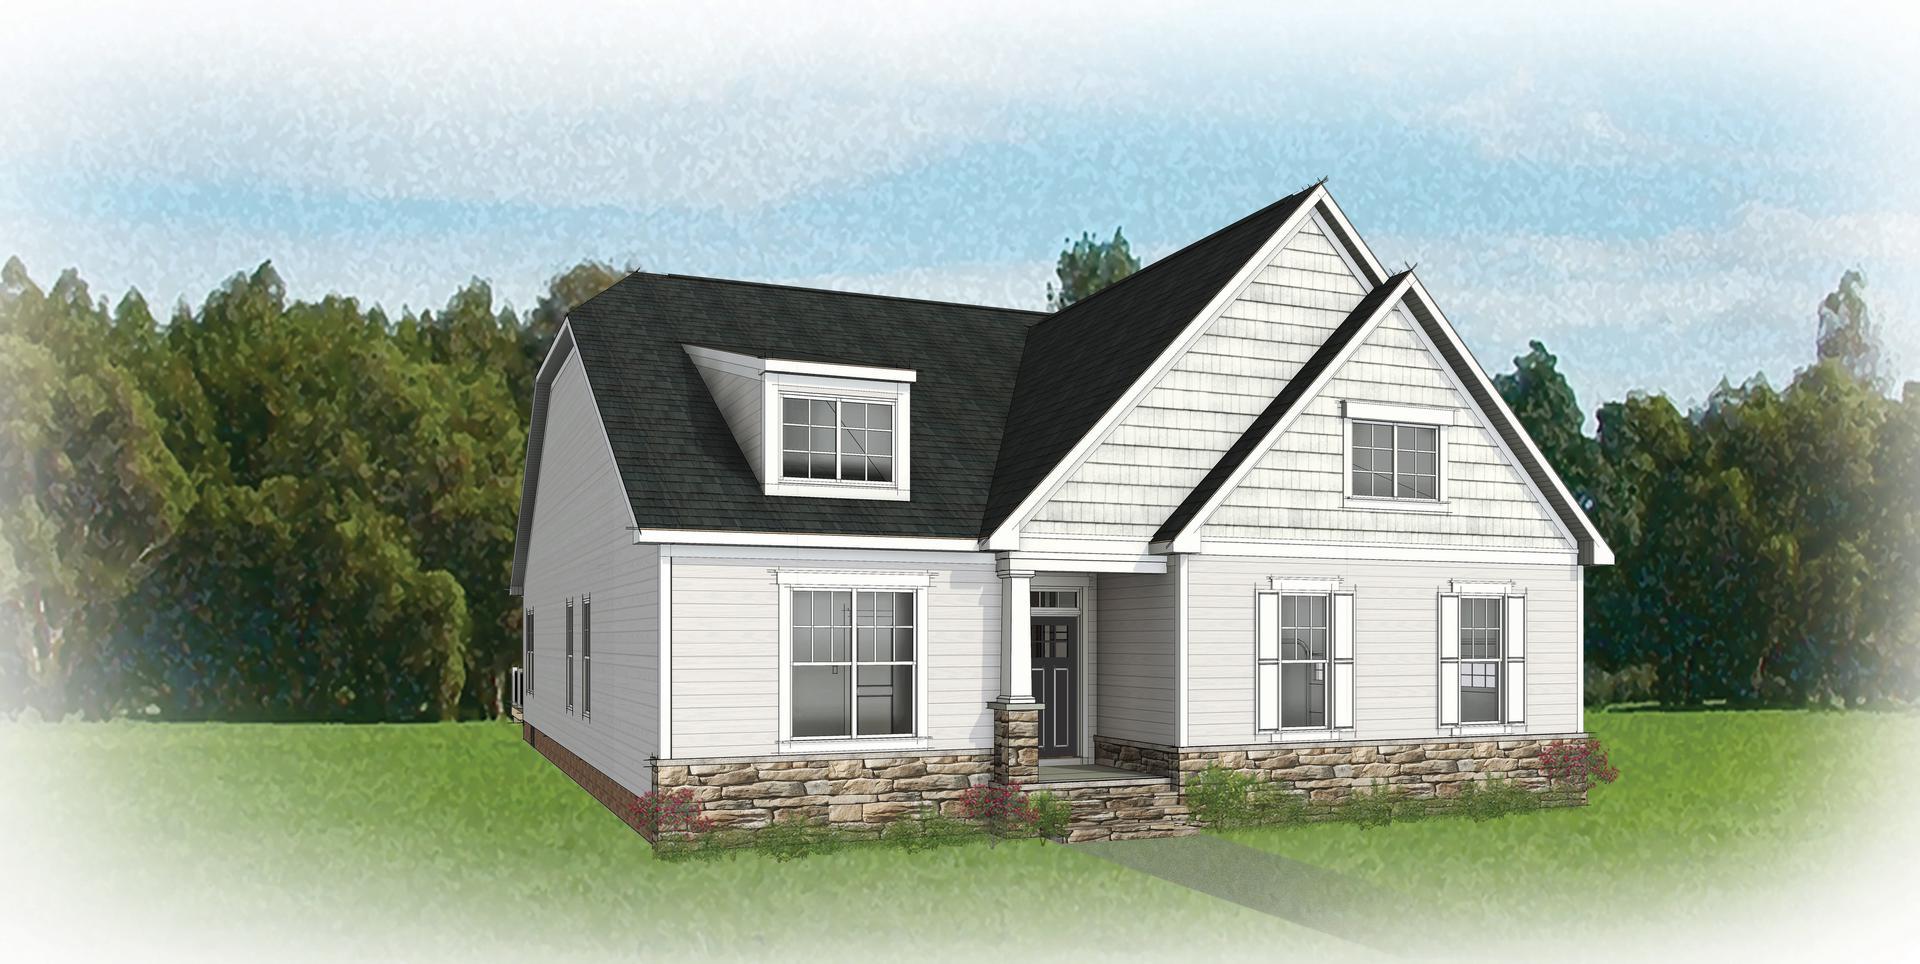 320 St. Andrews, Smithfield, VA 23430 Home for Sale